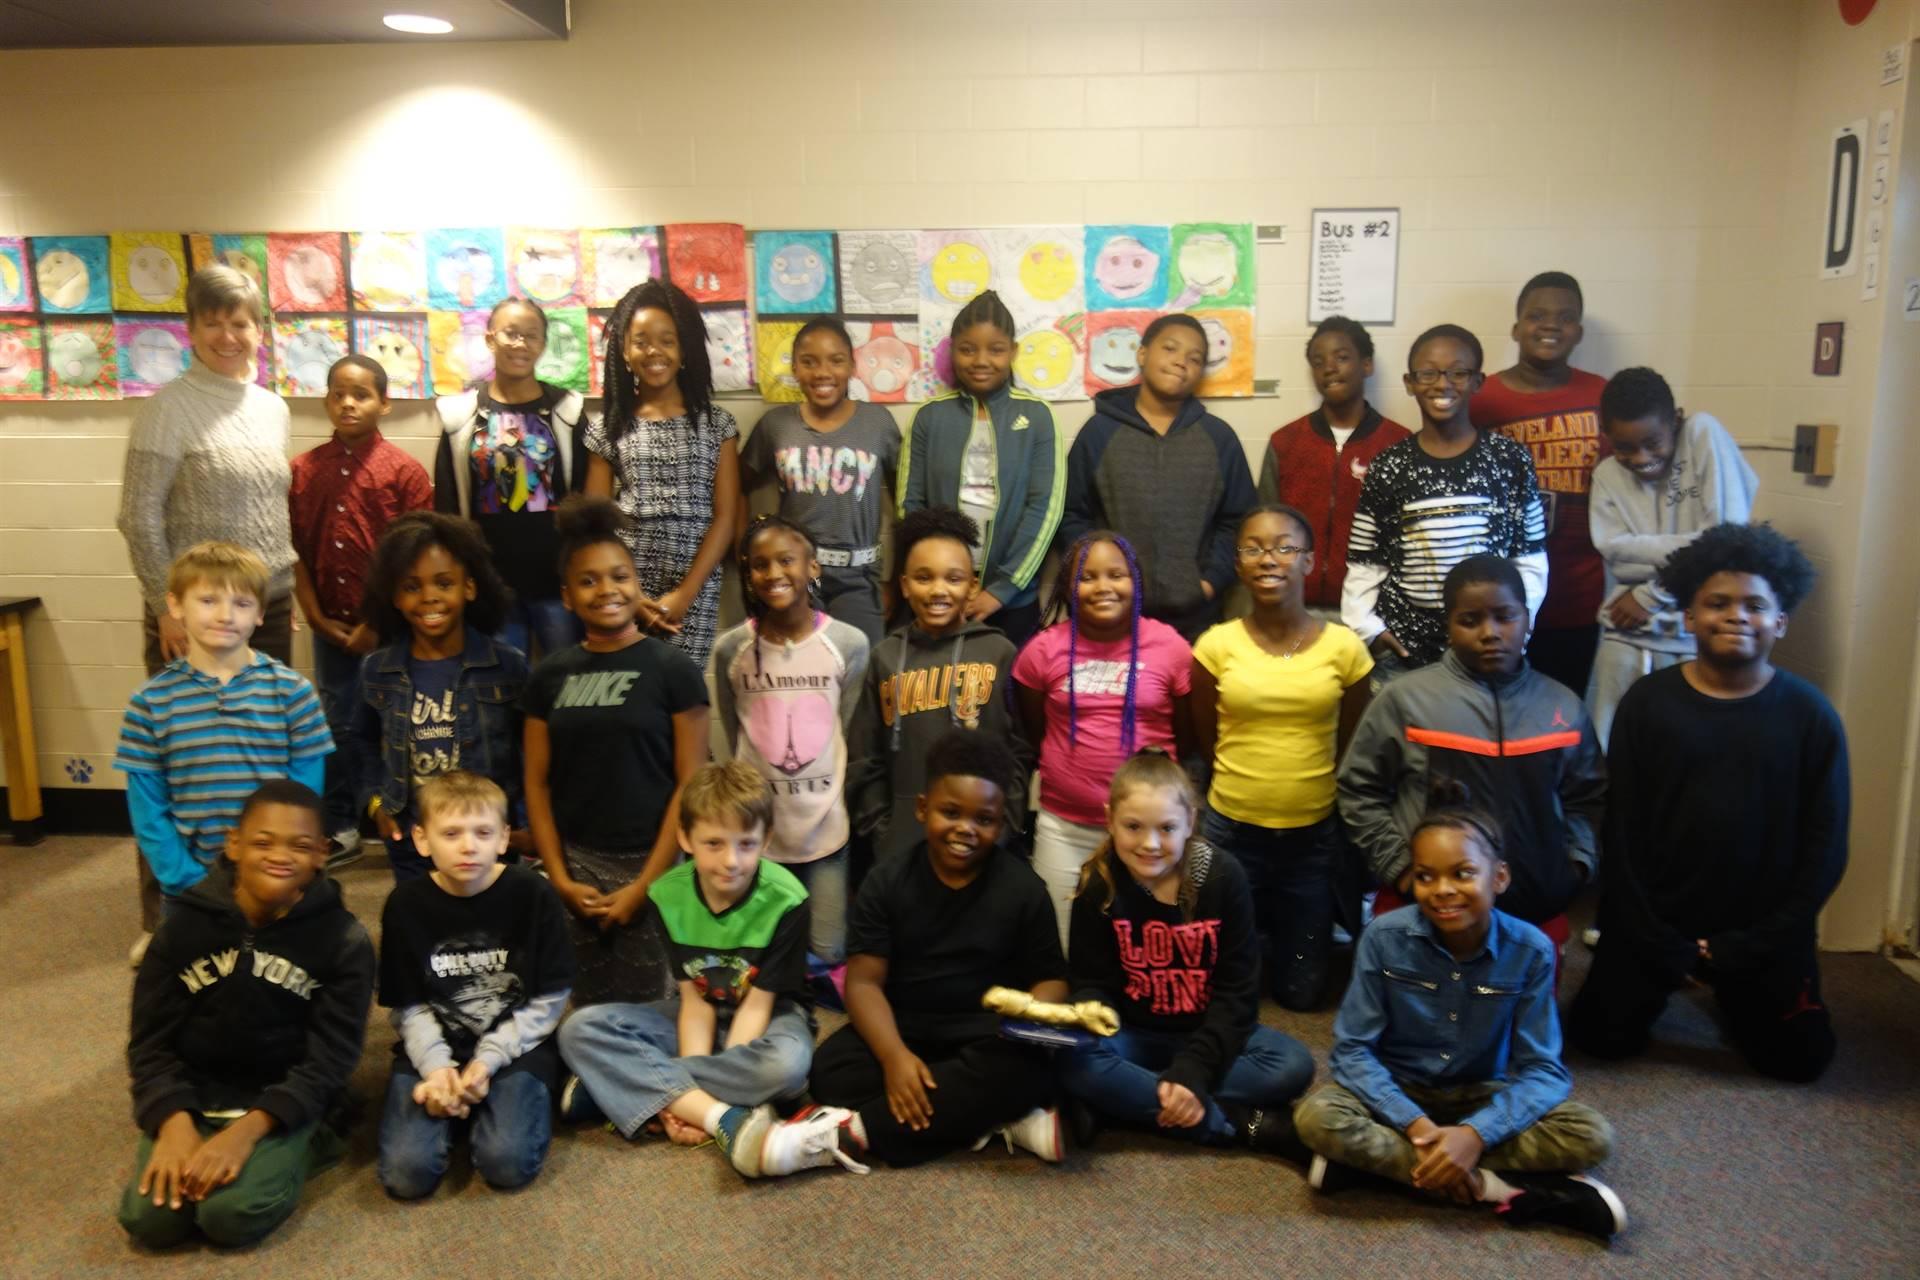 5th Grade - Mrs. Turk